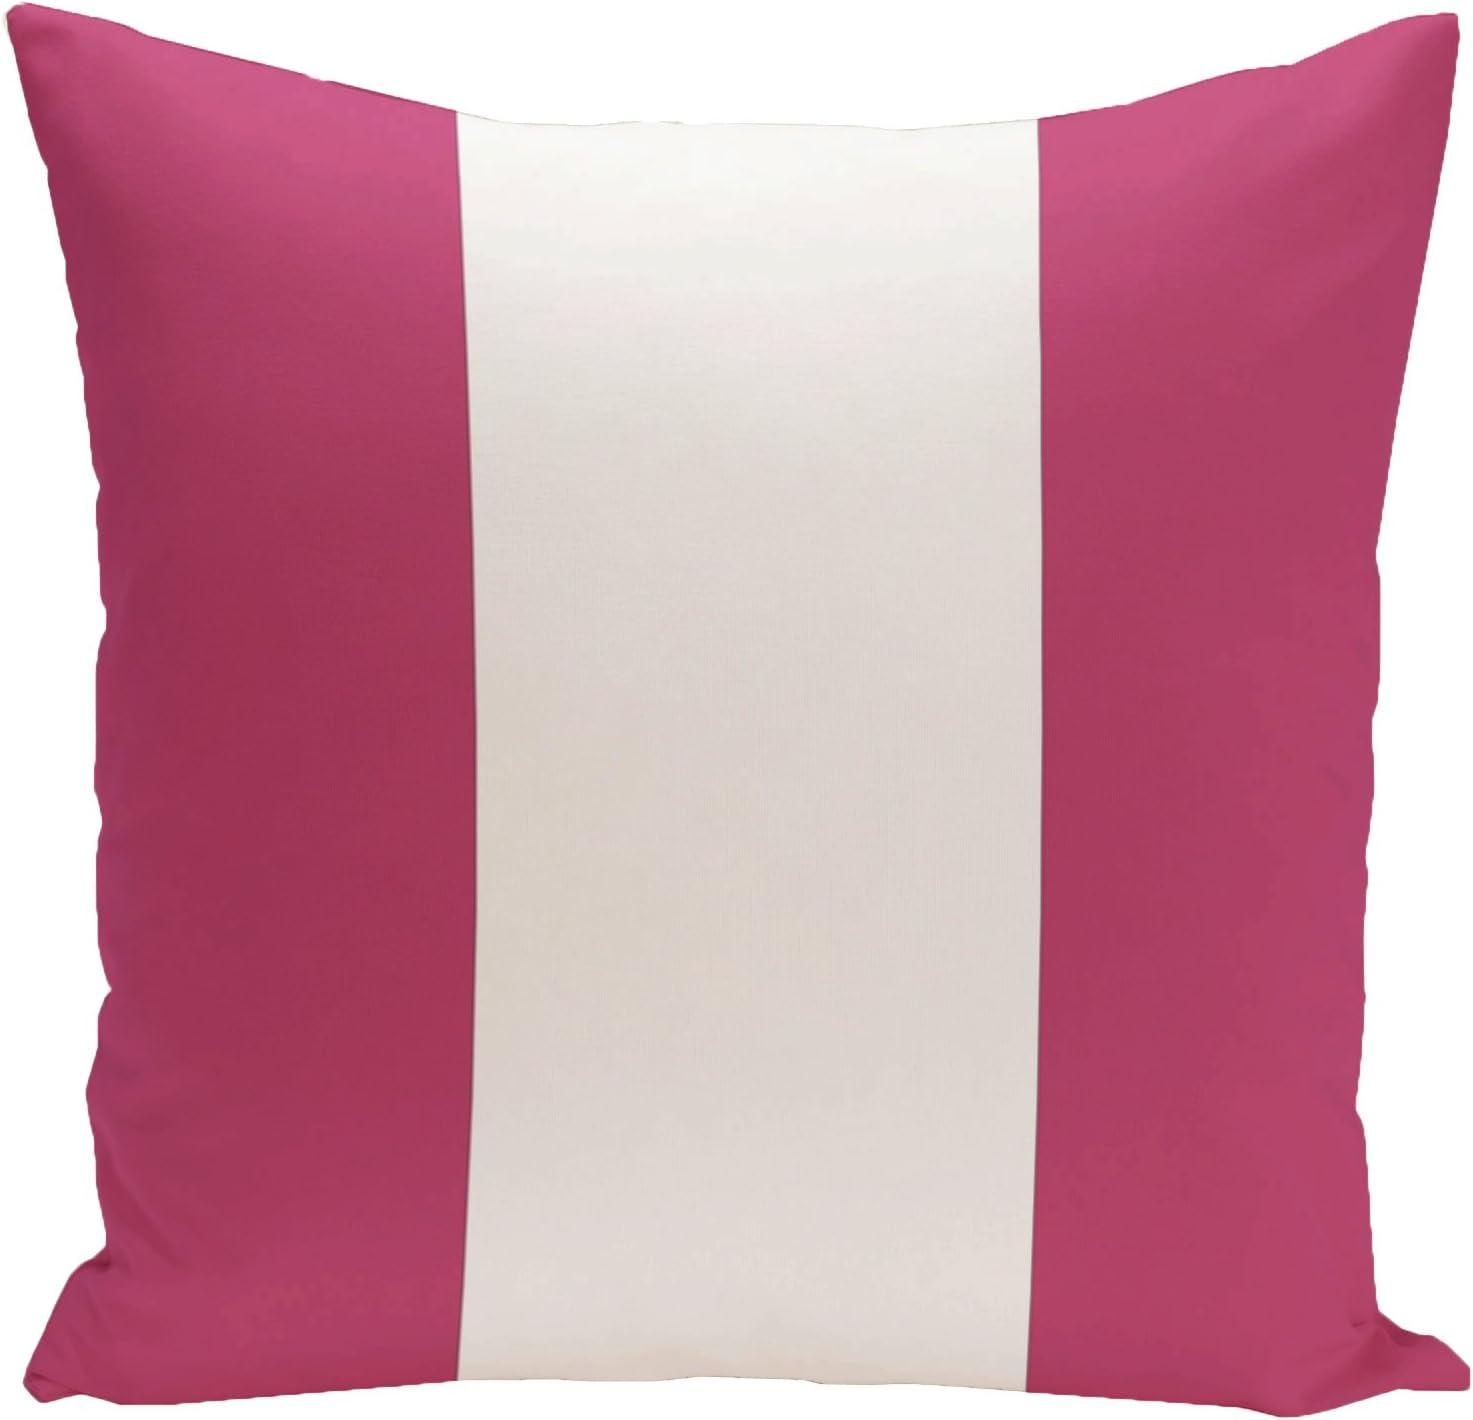 E by design Decorative Pillow Dazzling Blue